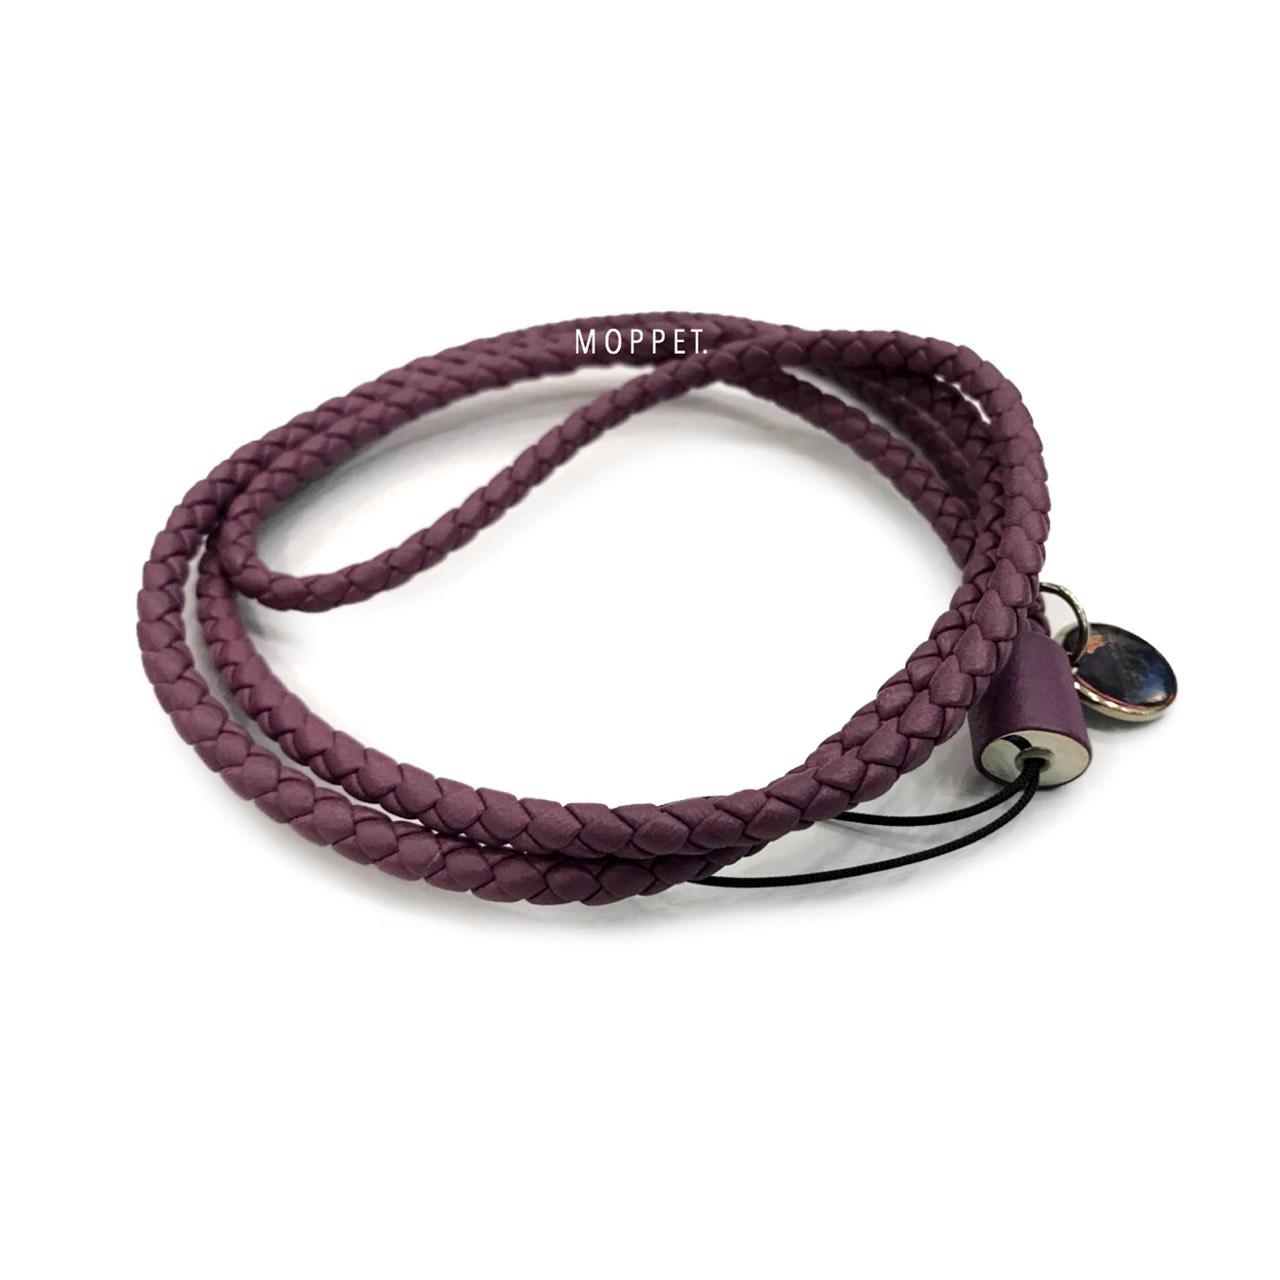 New Bottega Lanyard In Purple Leather SHW